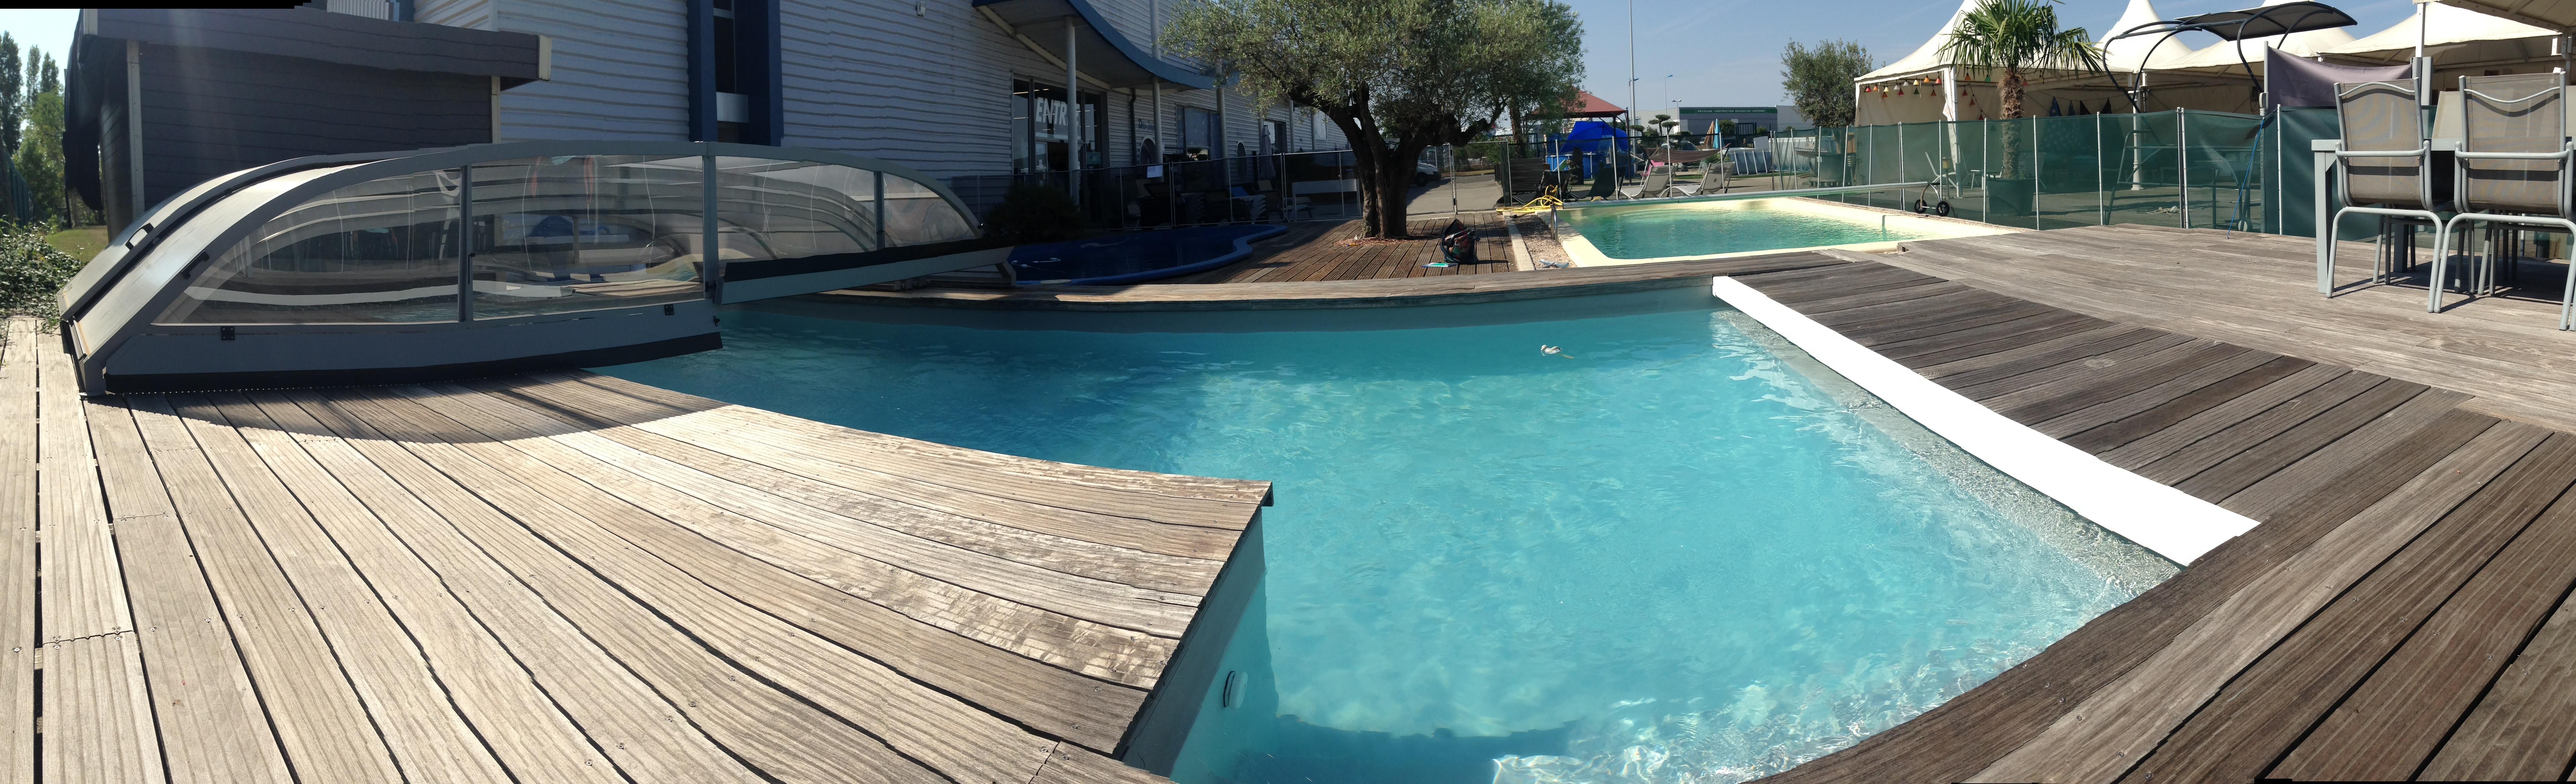 bache piscine sodipa